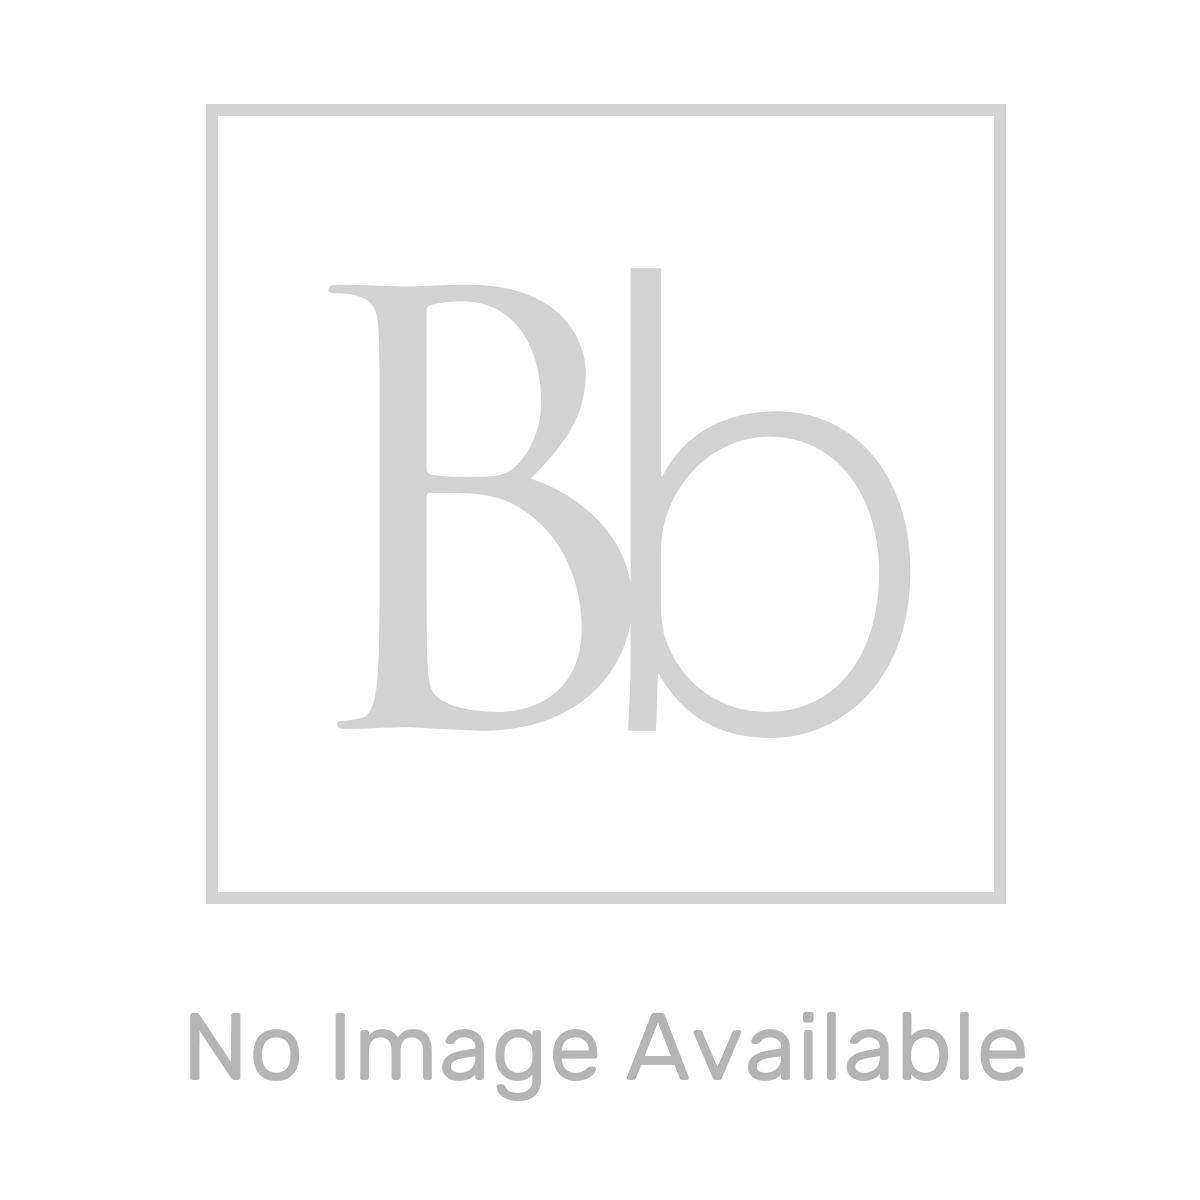 RAK Resort Wall Hung Toilet with Sandwich Soft Close Seat Measurements